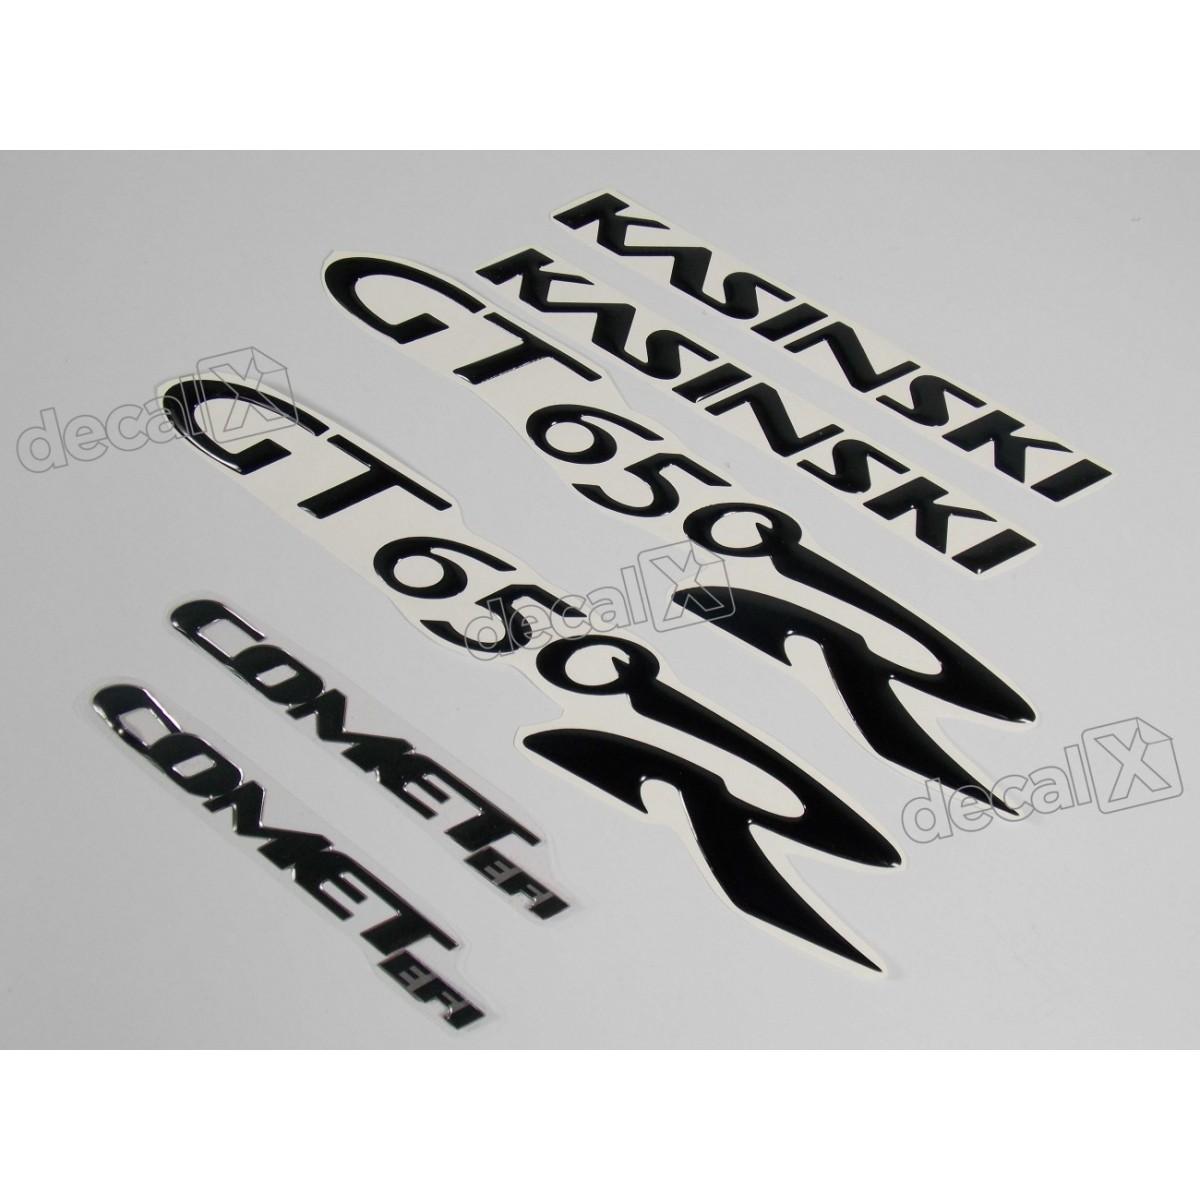 Kit Adesivos Kasinski Comet Gt 250r Em Preto 04